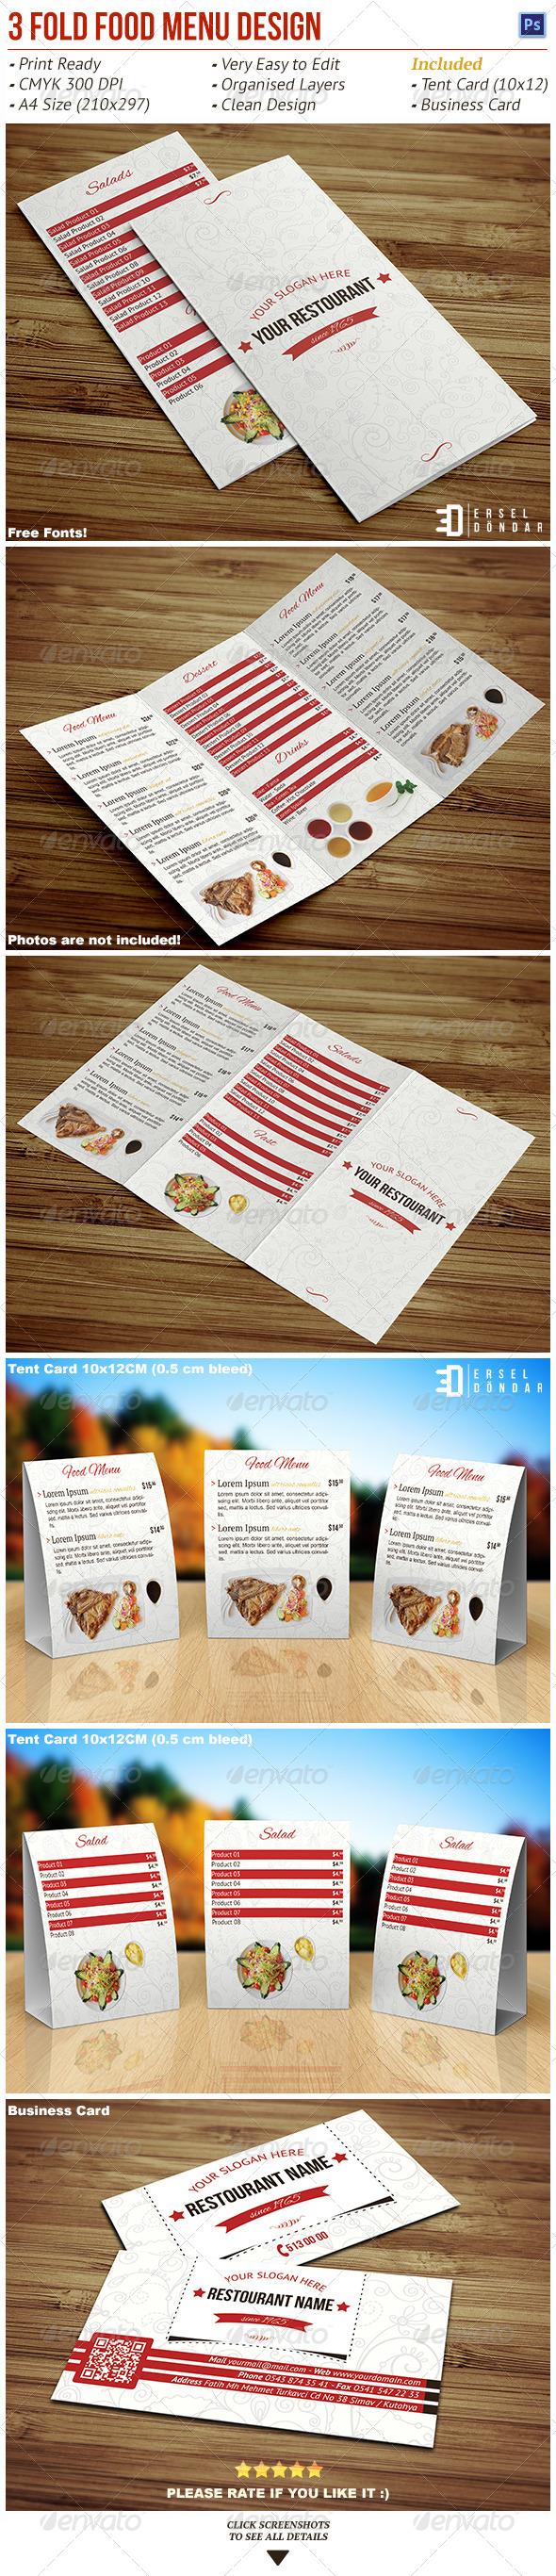 GraphicRiver Tri-Fold Food Menu Design 5389511